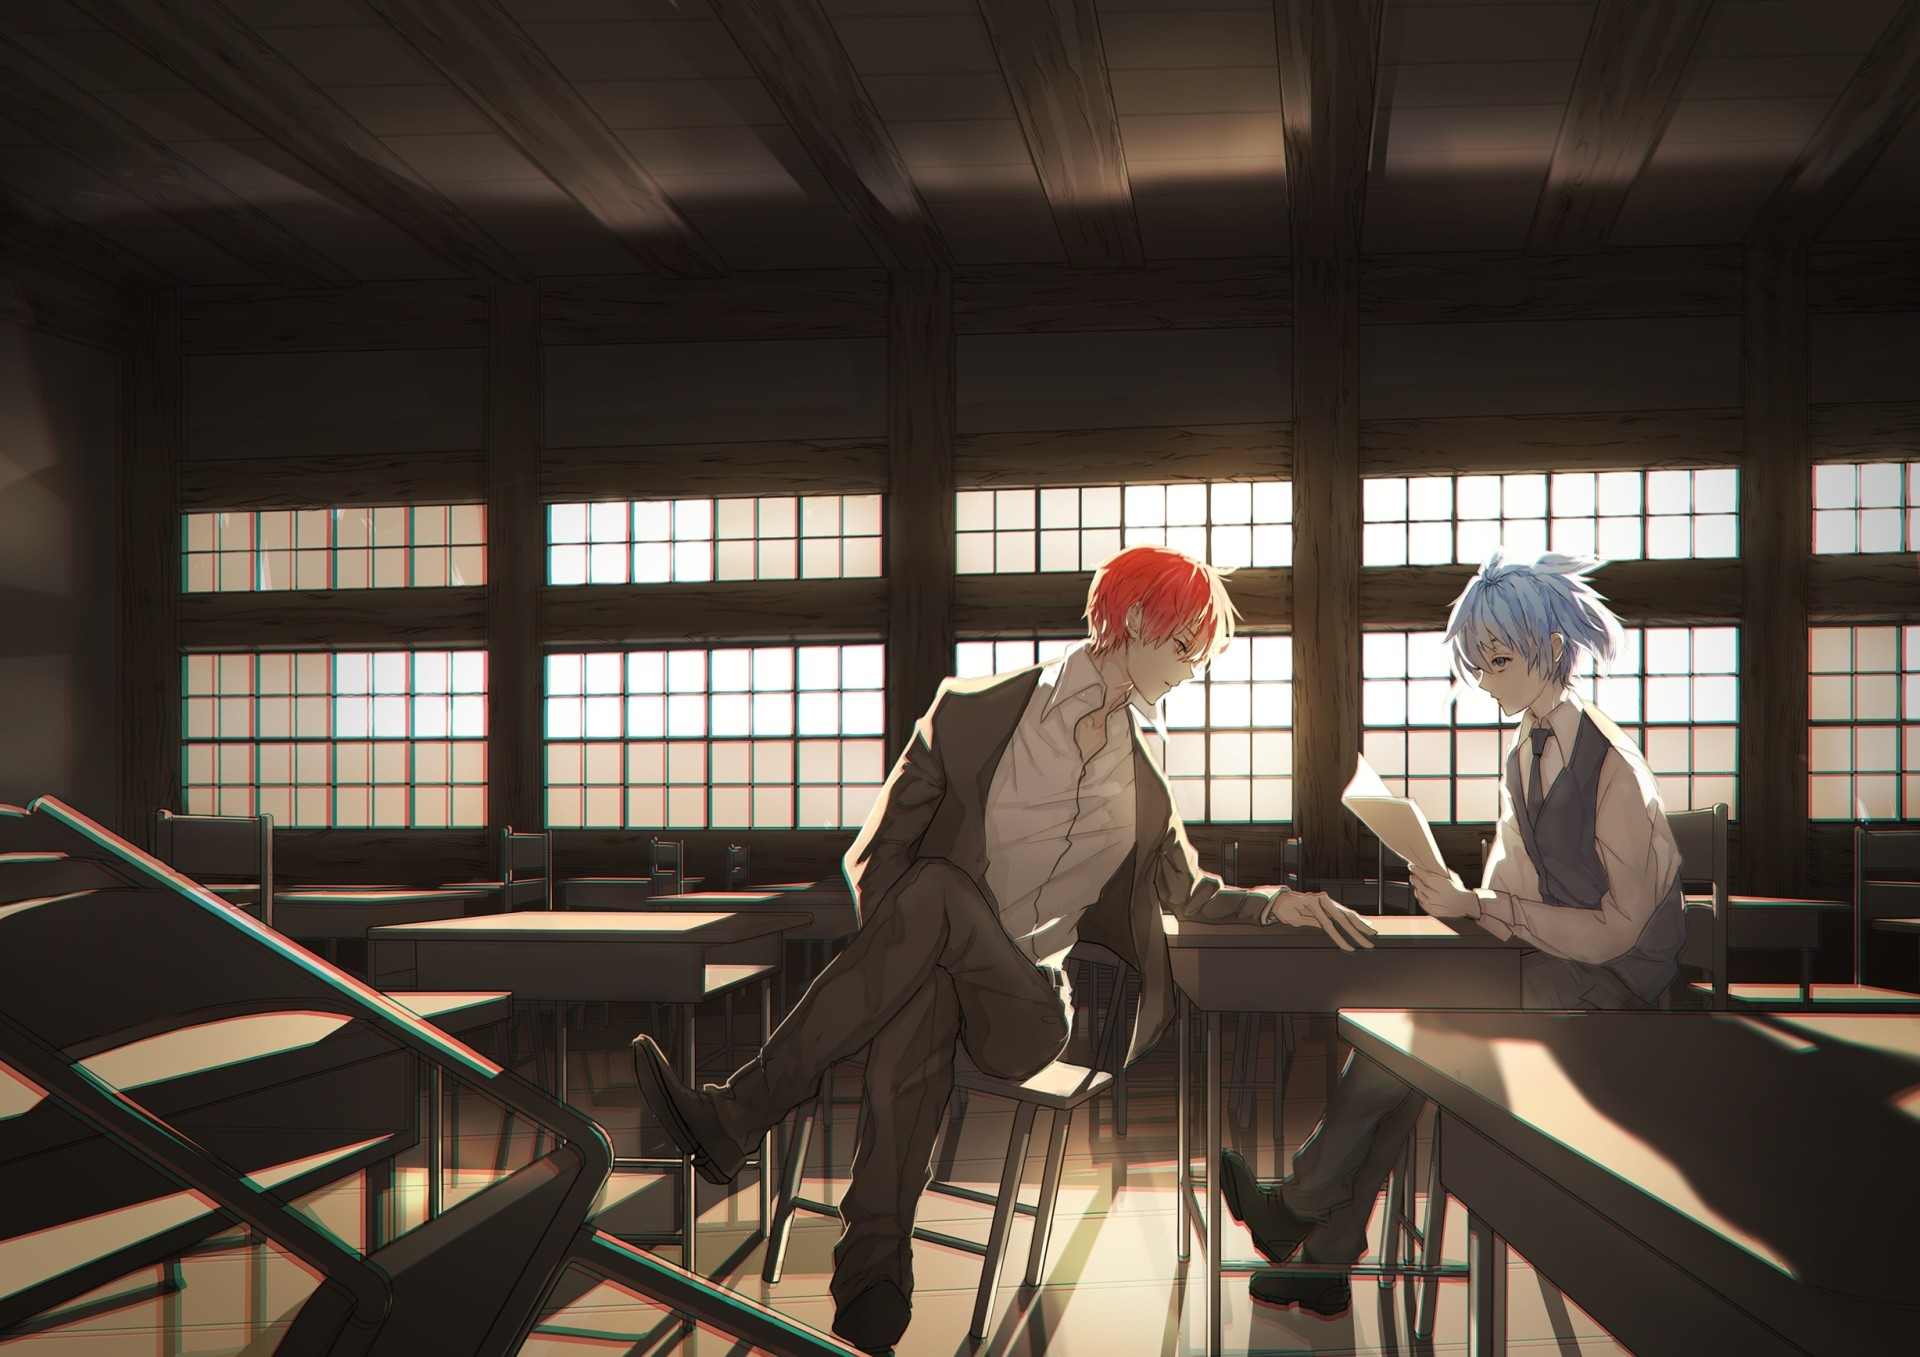 Anime Assassination Classroom Karma Akabane Nagisa Shiota Wallpaper